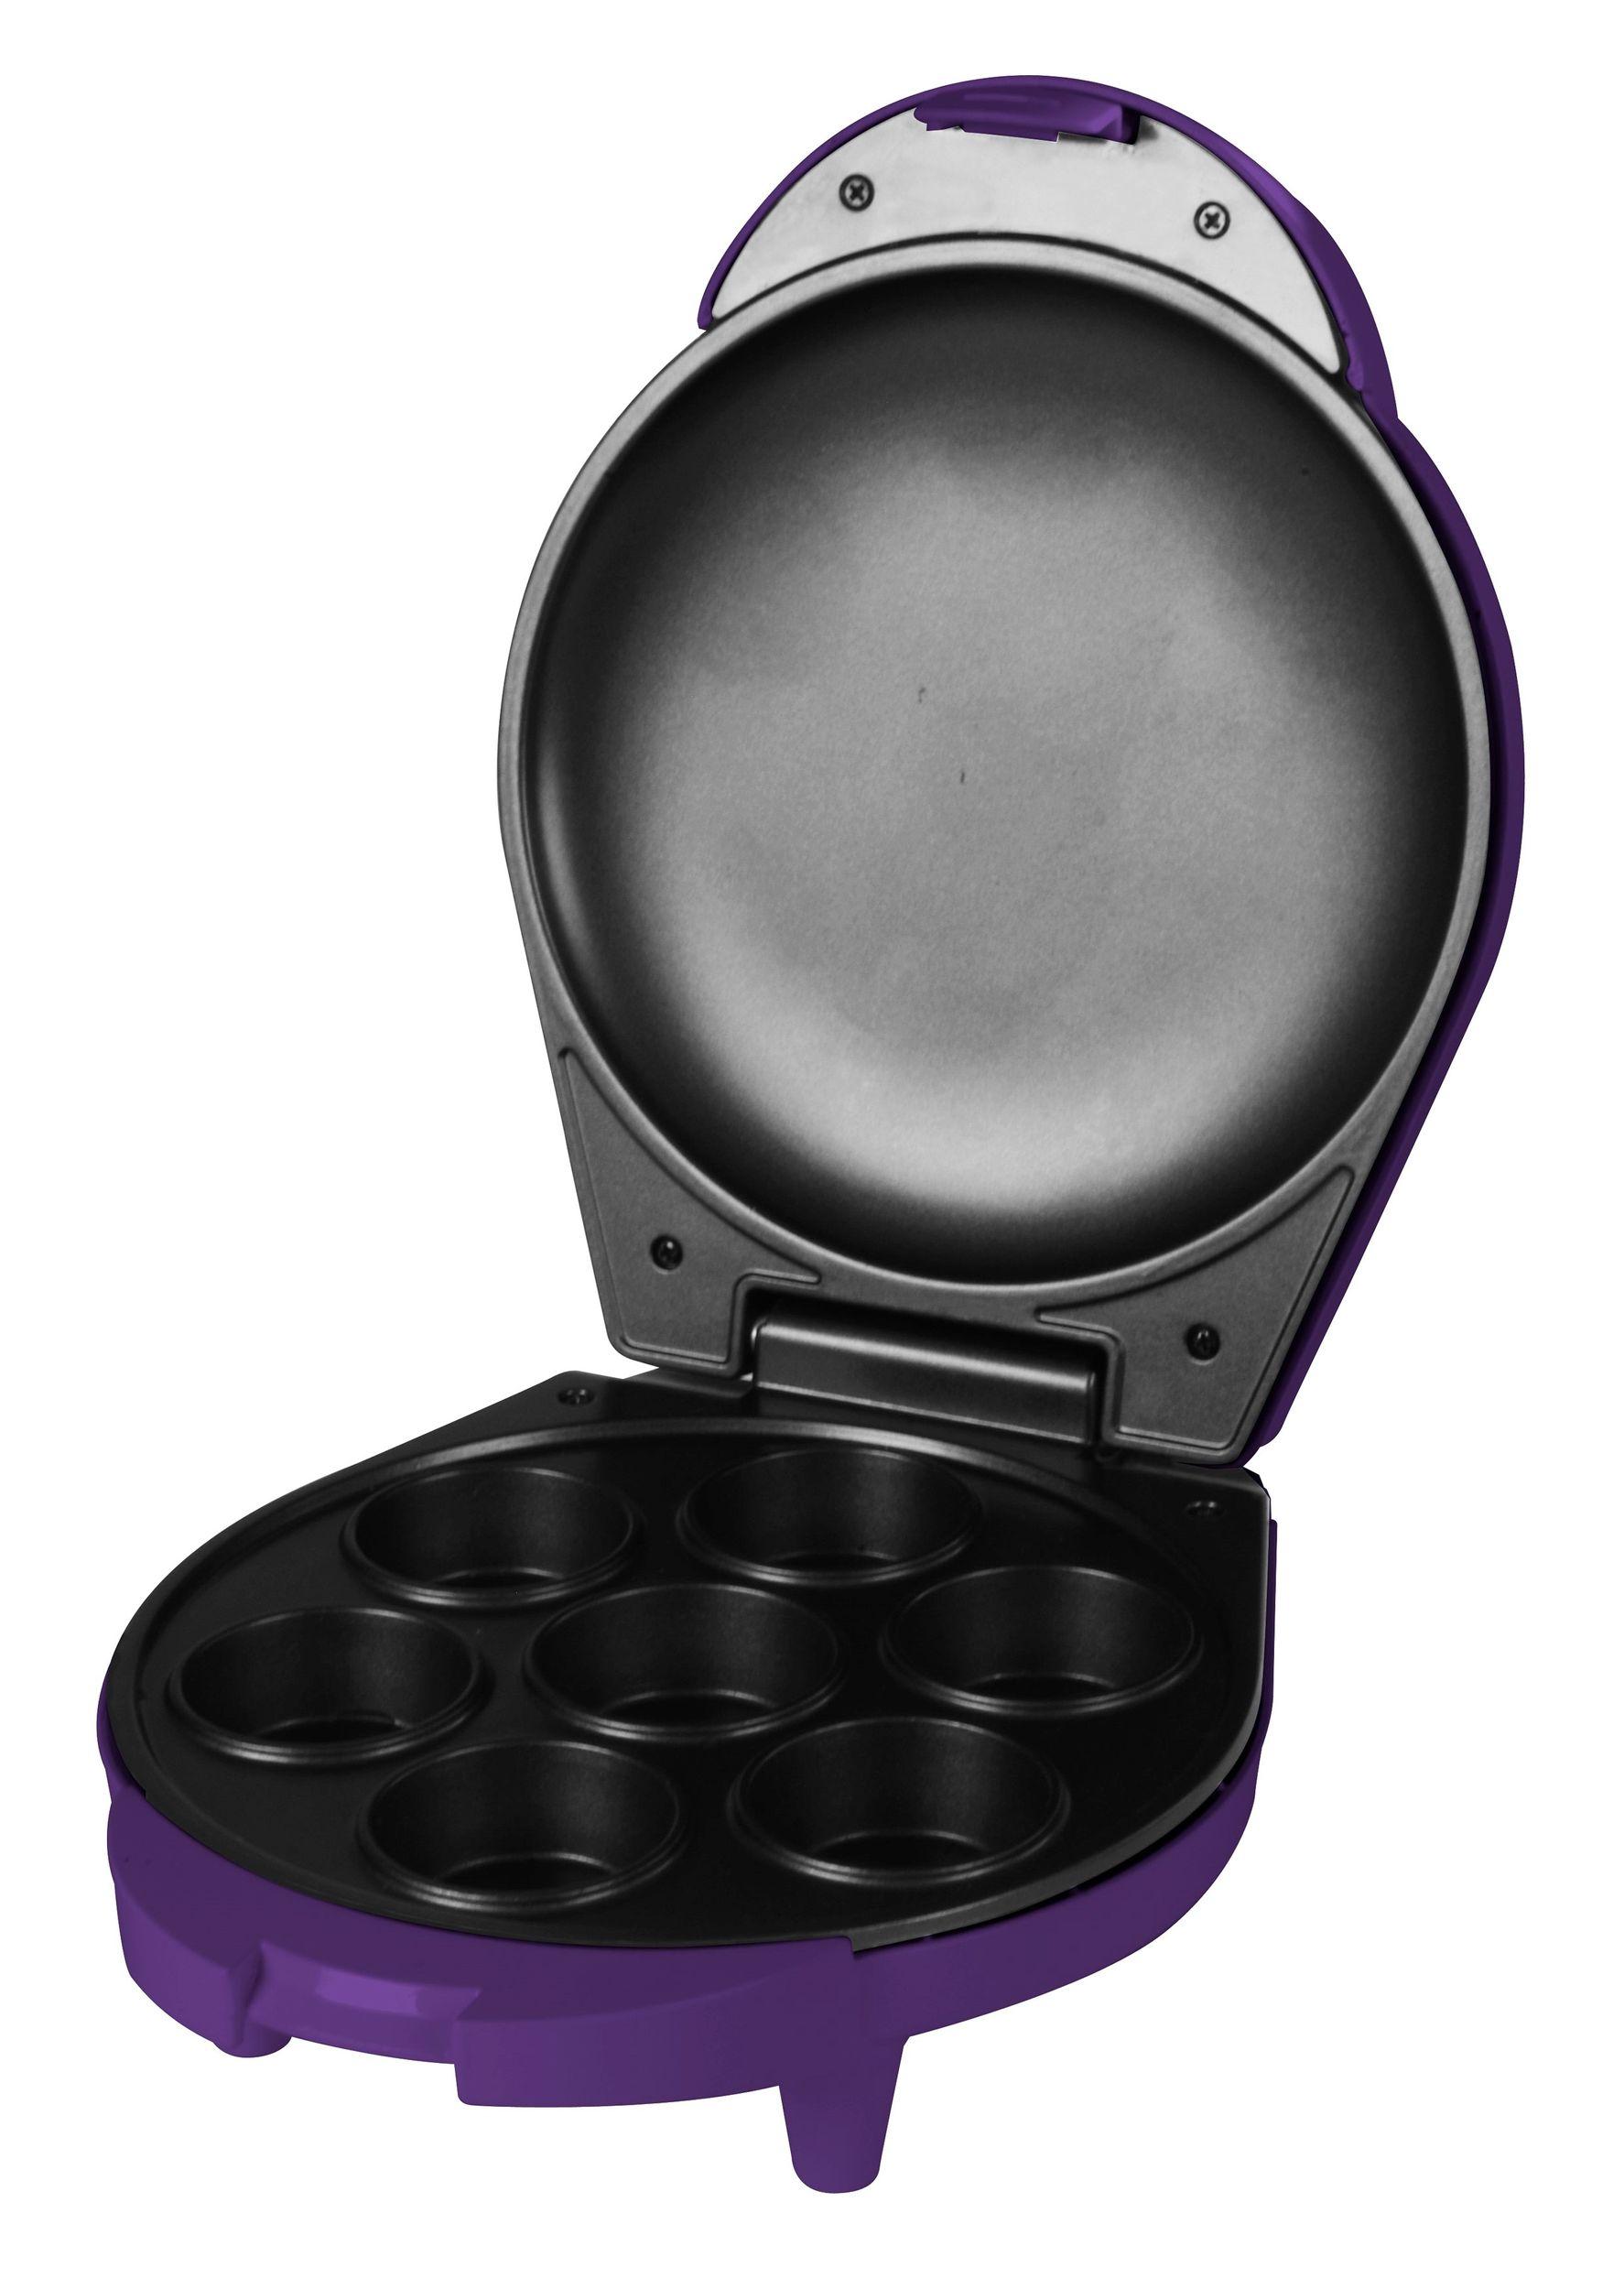 Muffinmaker Muffin Bäcker 7 Muffins Cupcakes lila 700W(Karton defekt)*12563 Bild 4